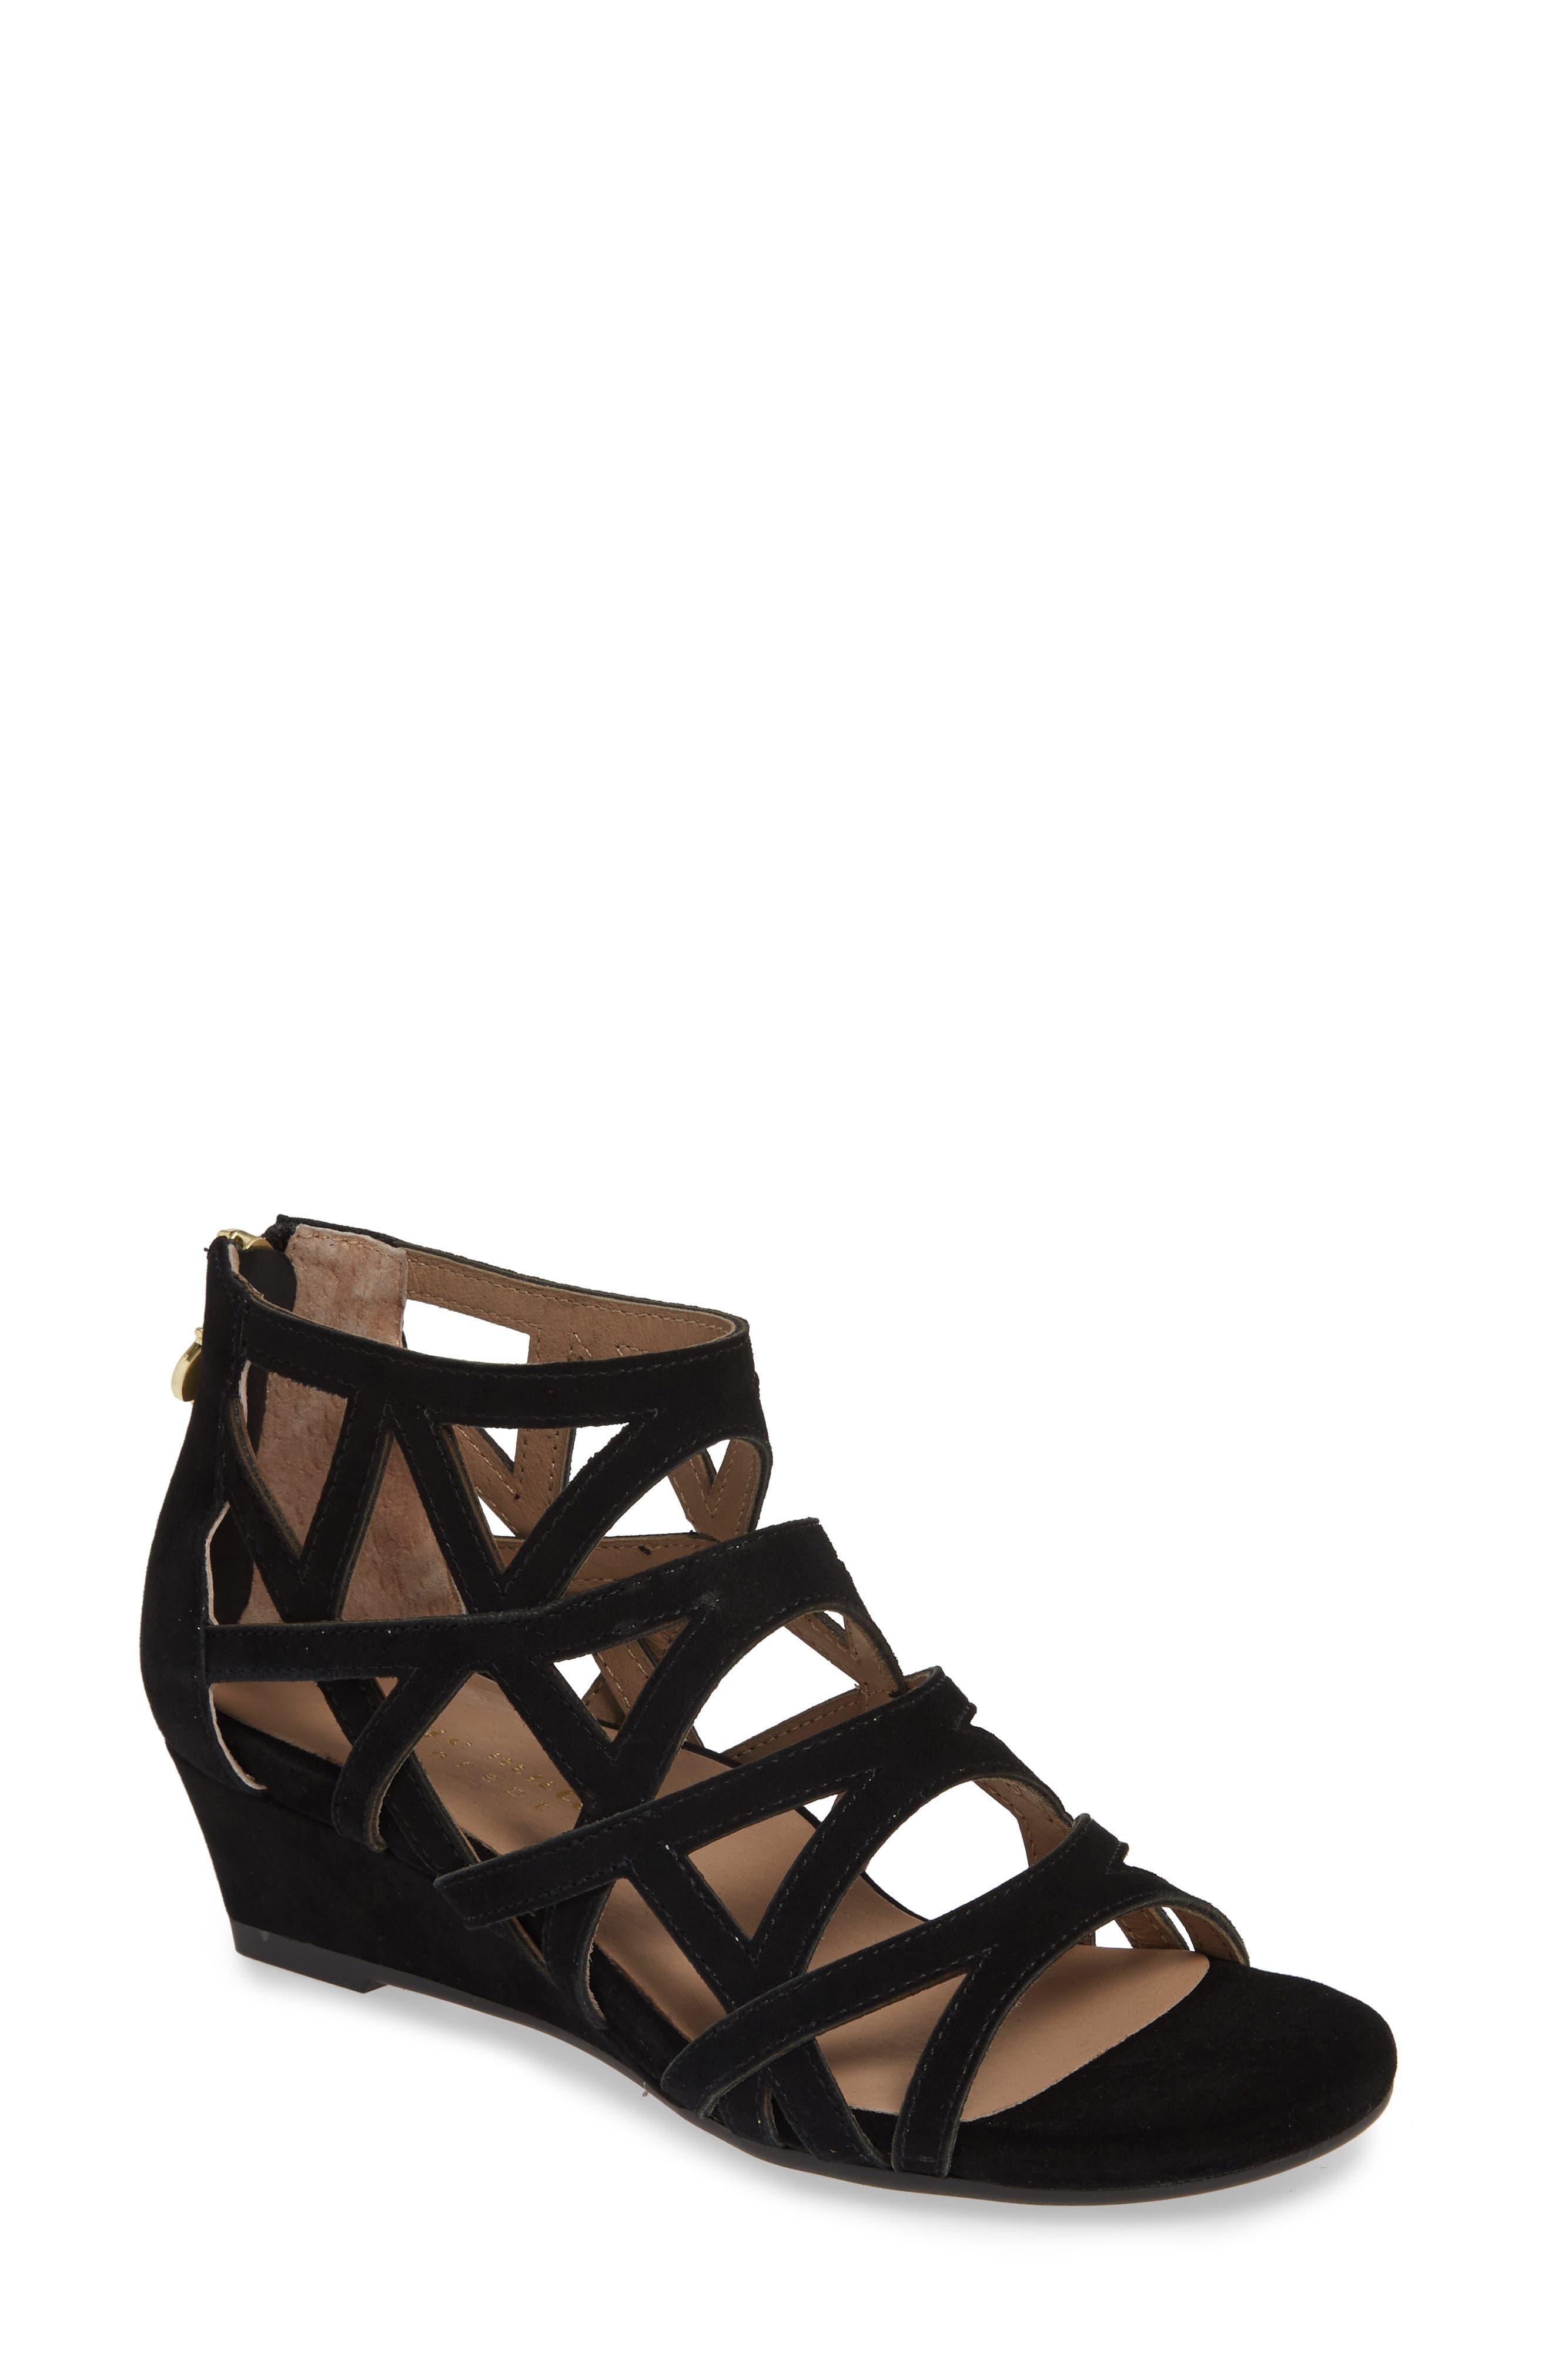 Bettye Muller Concepts Sashi Cutout Sandal, Black